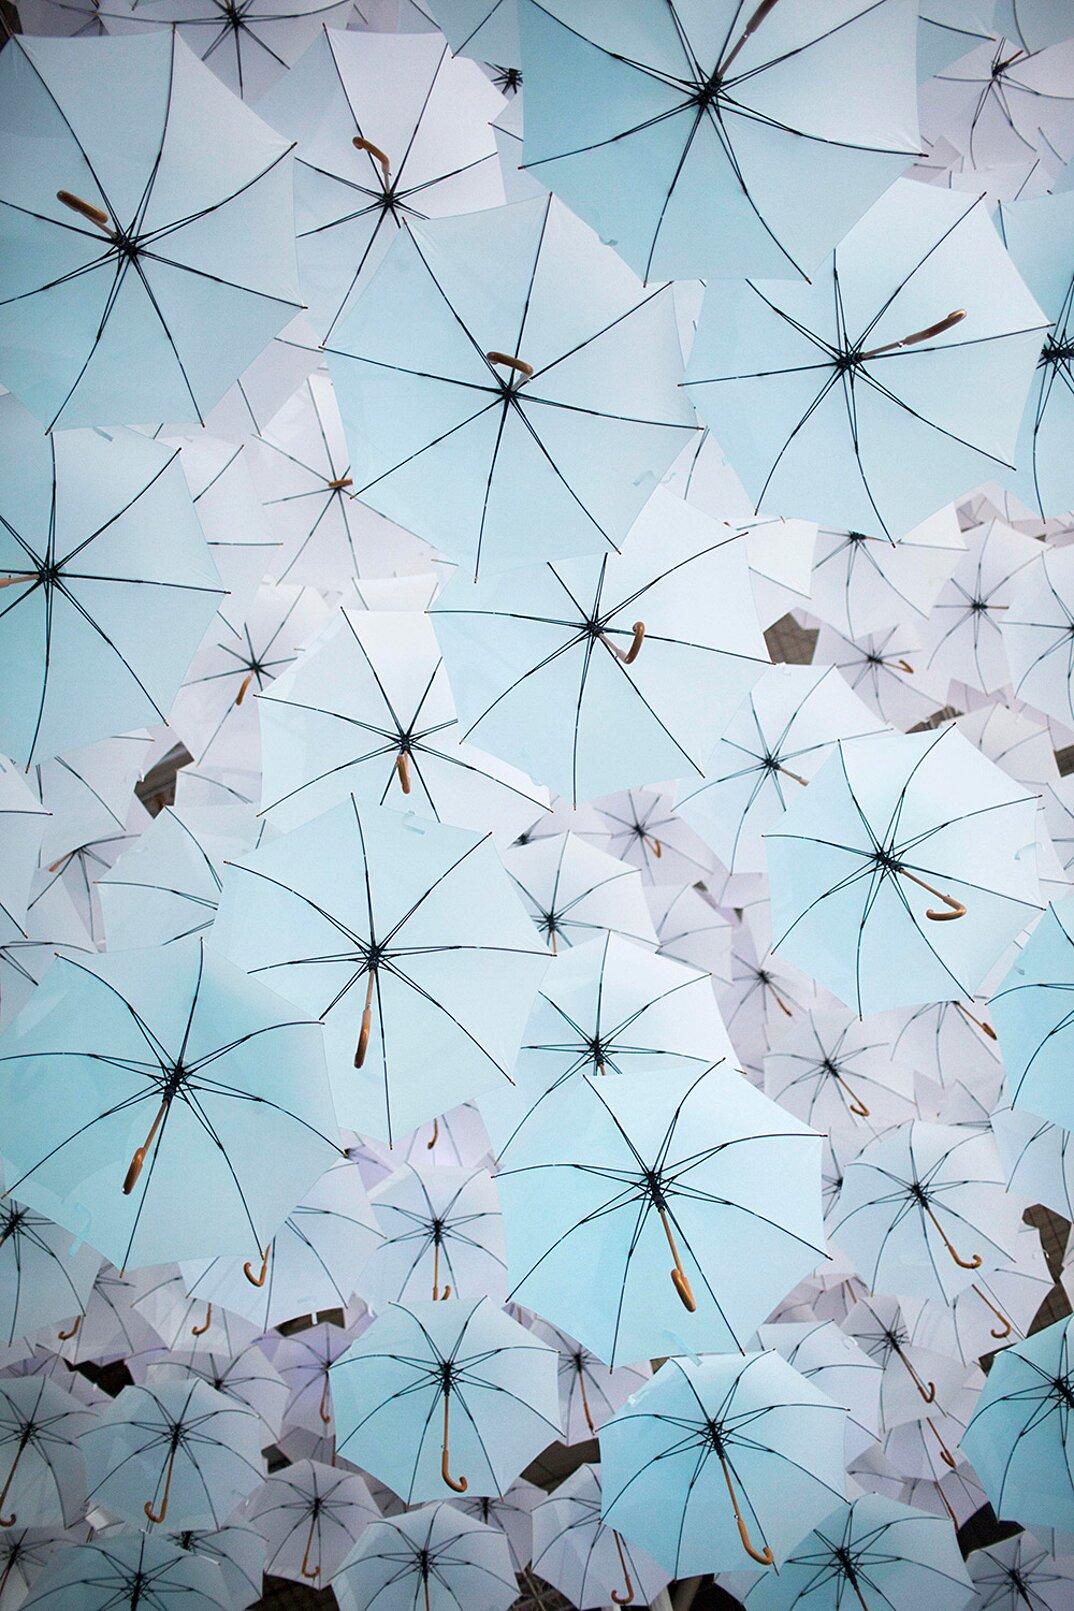 nuvola-ombrelli-bianchi-fiera-design-habitare-helsinki-habitare-3-keb